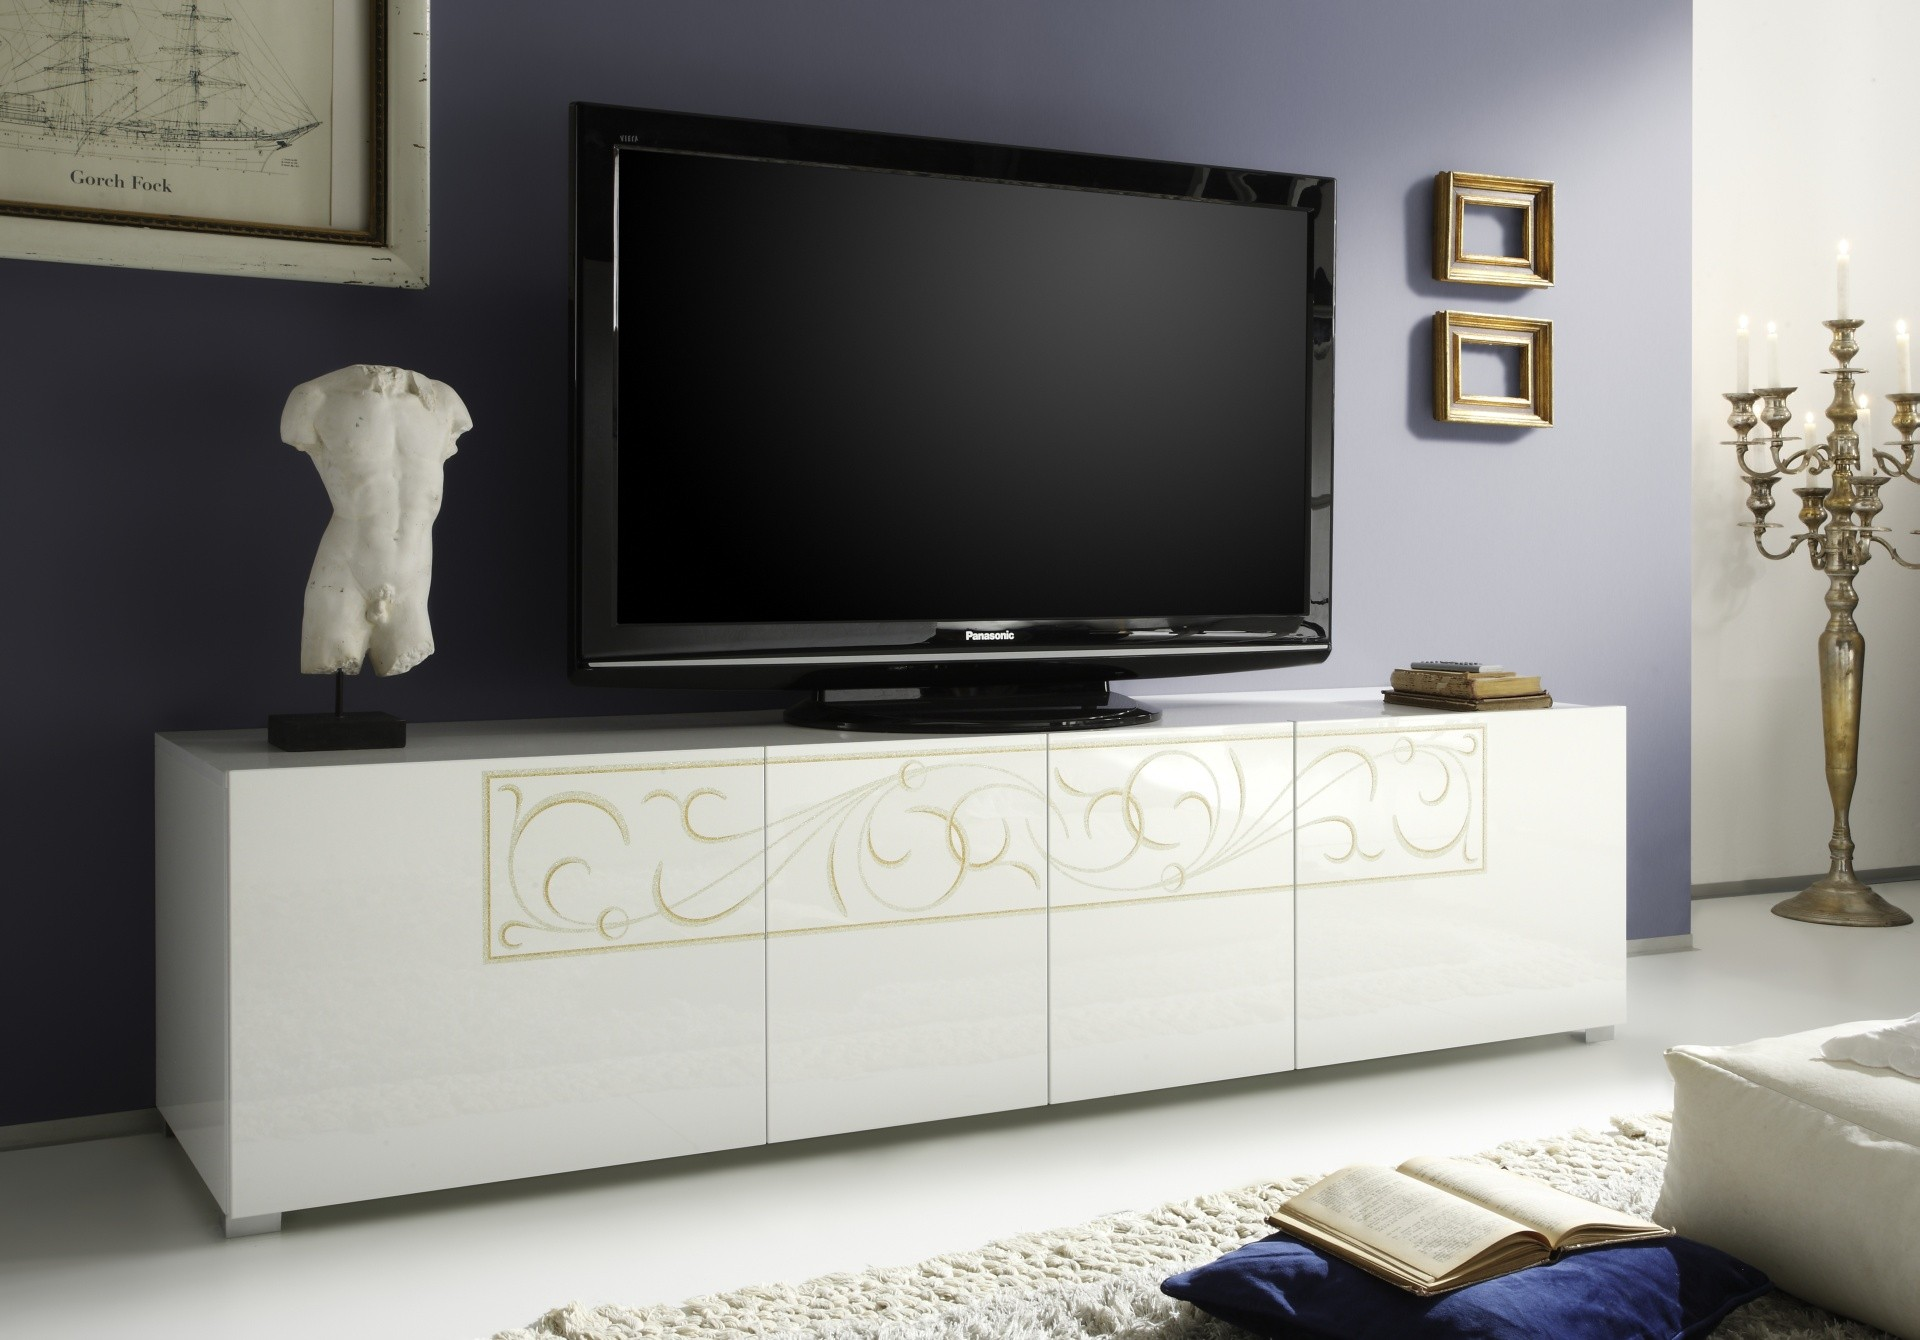 Meuble Tv Design 160 Cm Laqu Blanc Mat Et B Ton Dov Gdegdesign # Meuble Tv Laque Couleur Taupe